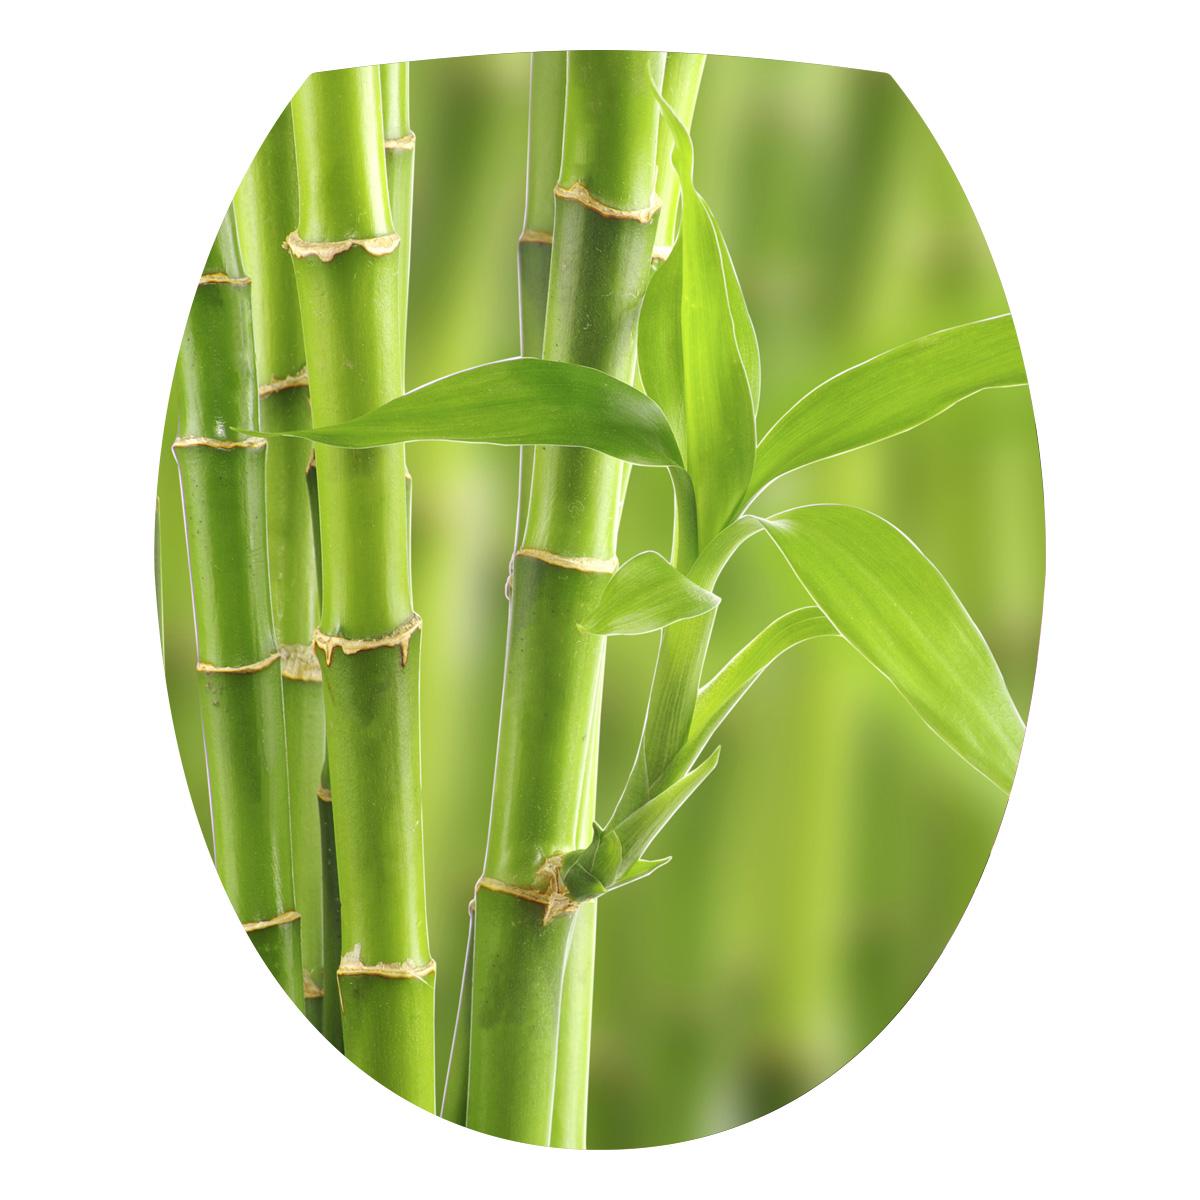 Stickers Muraux Pour Wc Sticker Mural Vert Branche De Bambou